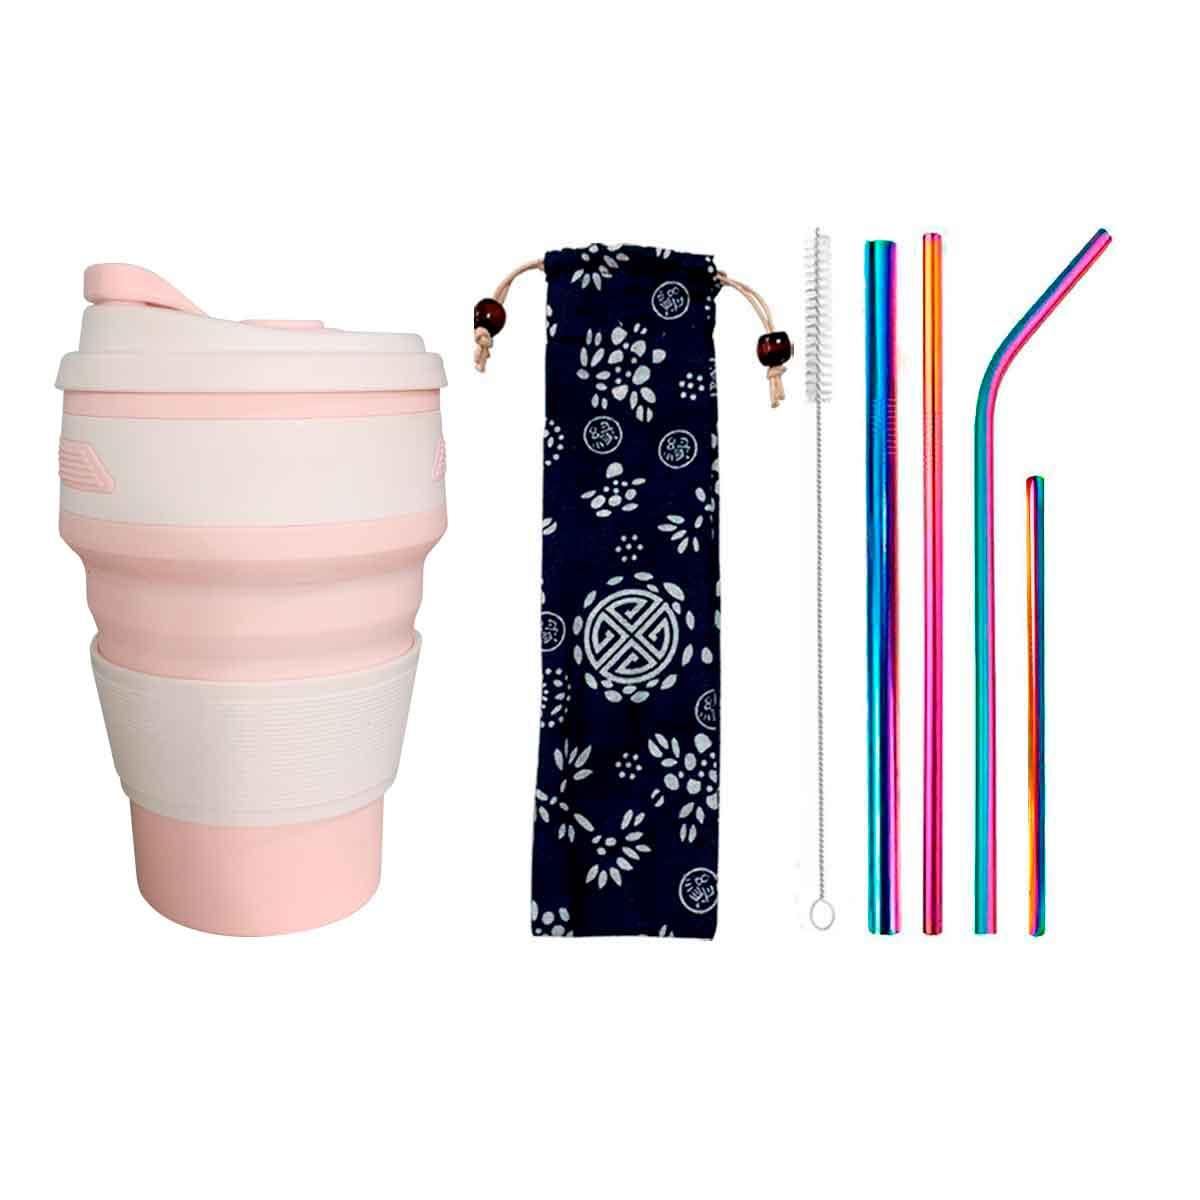 Kit 6 em 1 Inox Rainbow Florido + Copo Retrátil